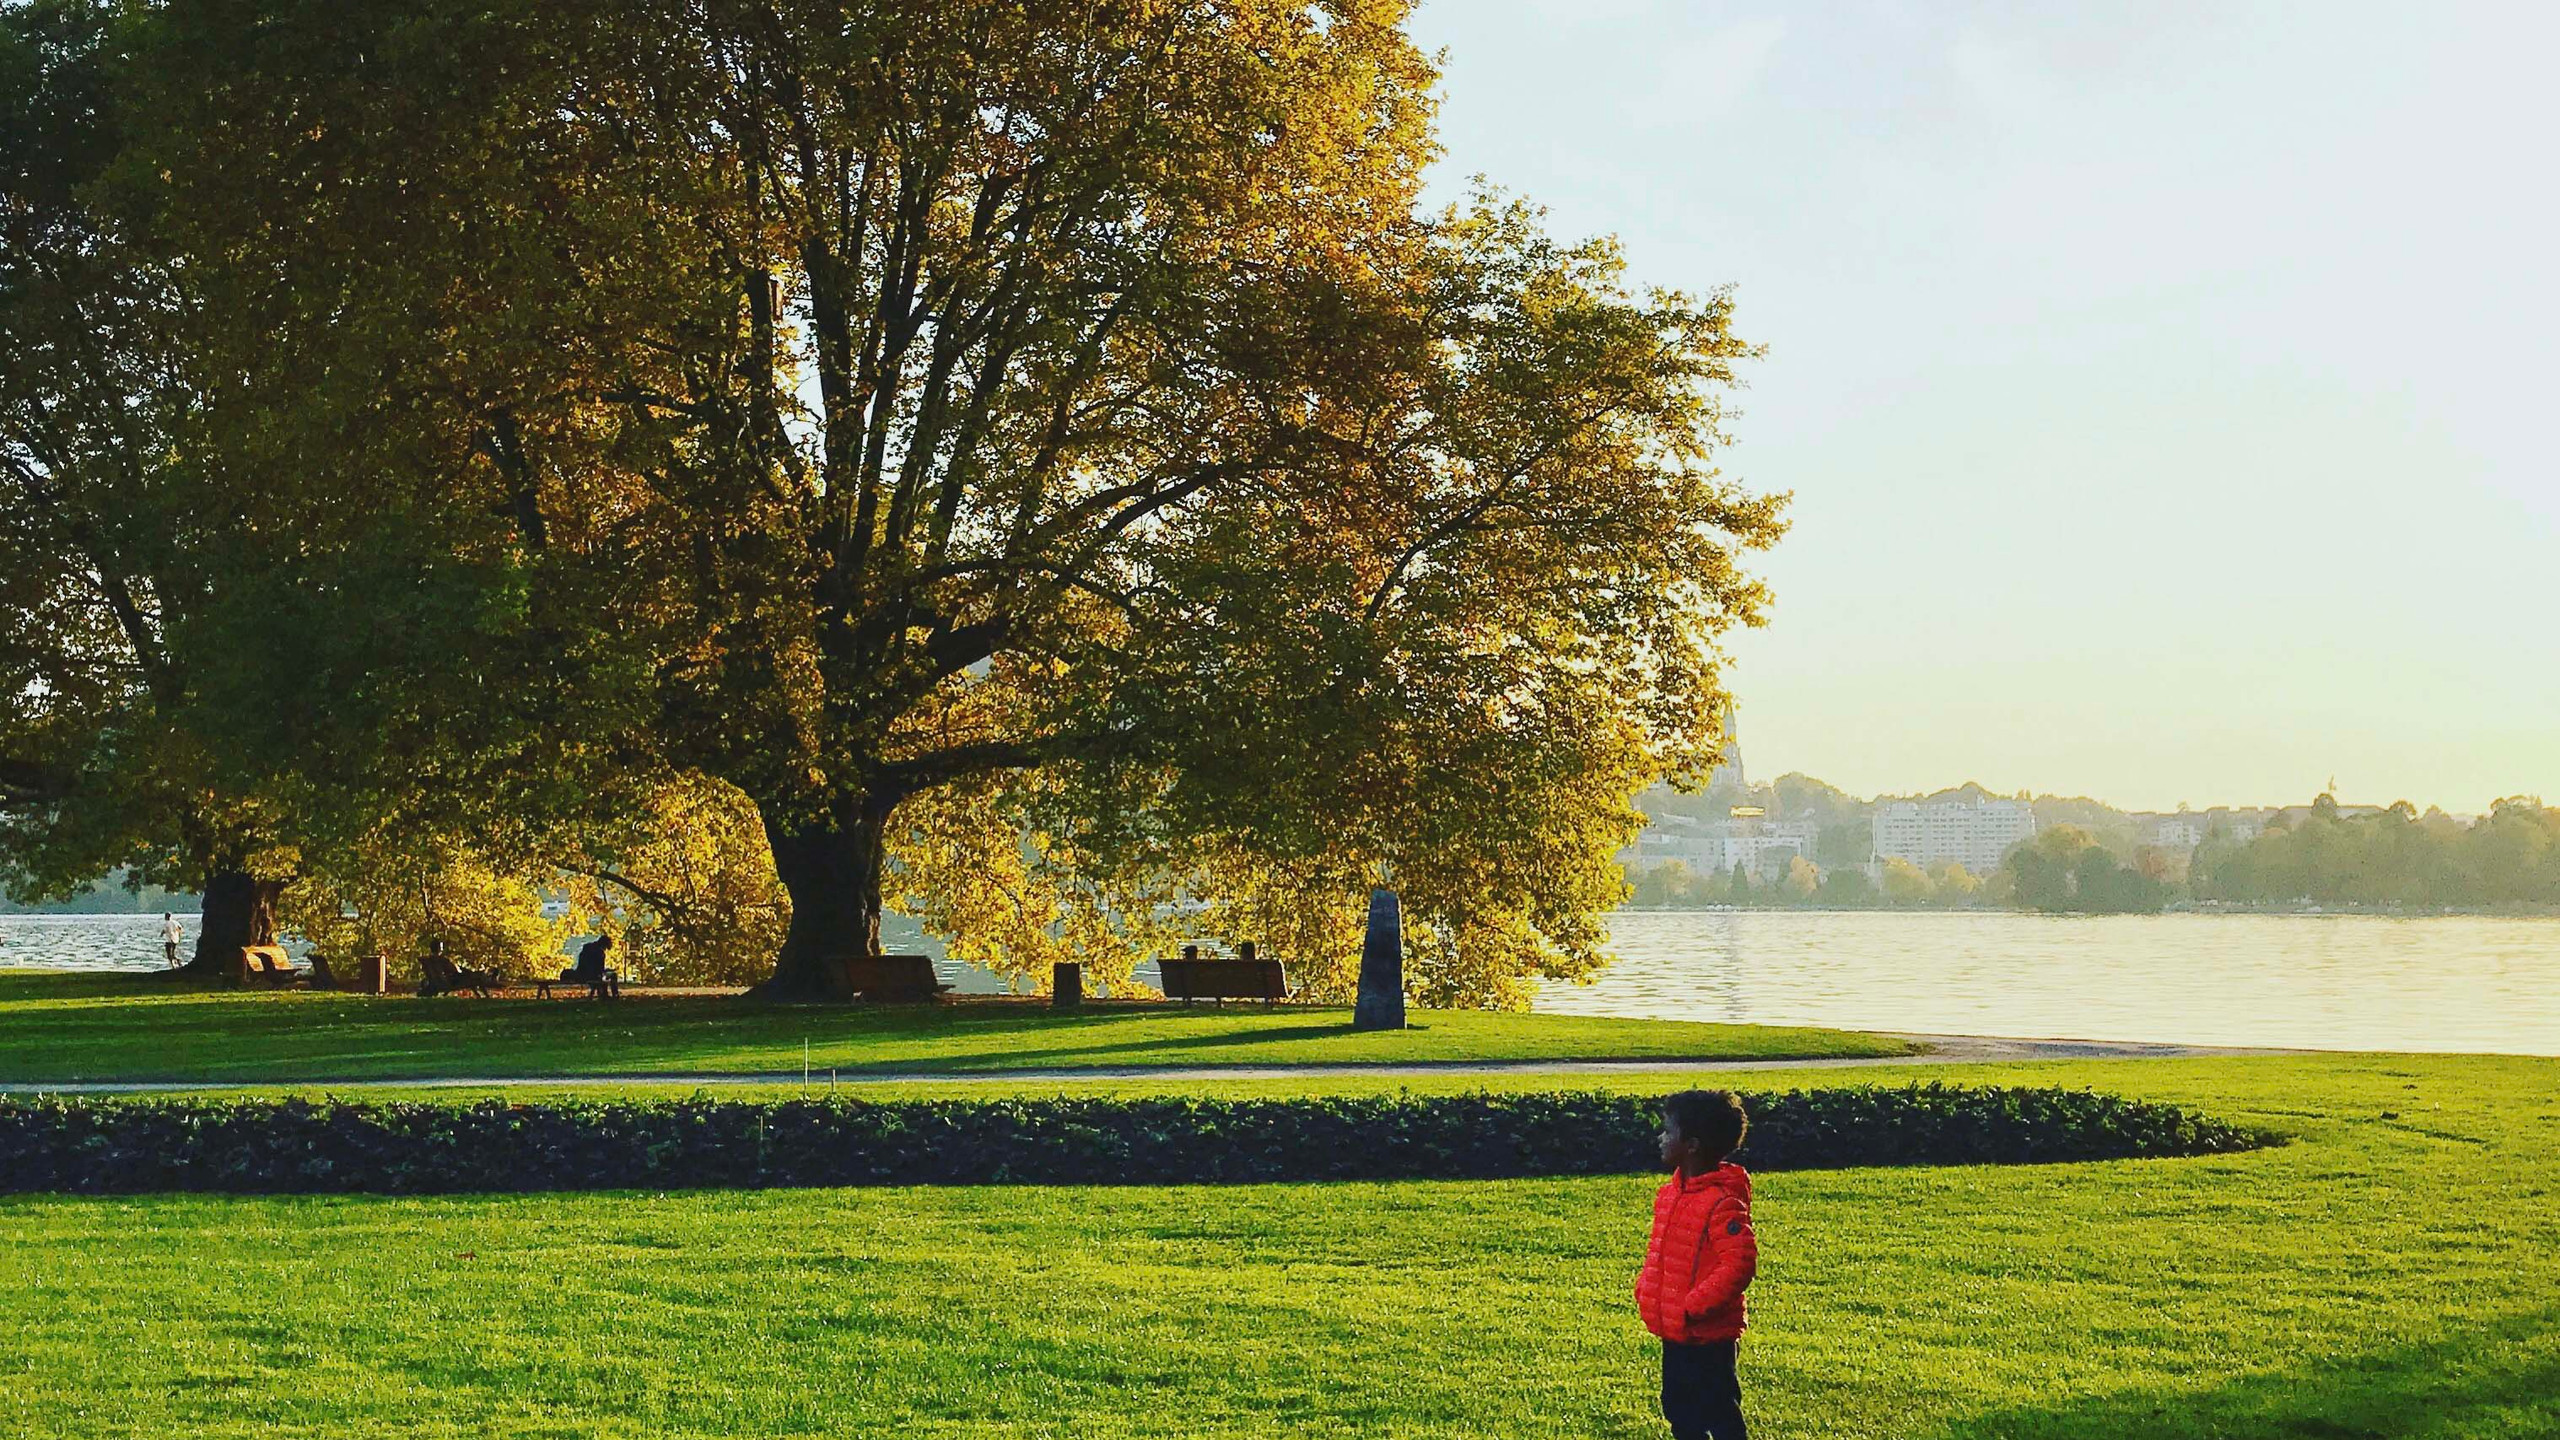 automne à Annecy